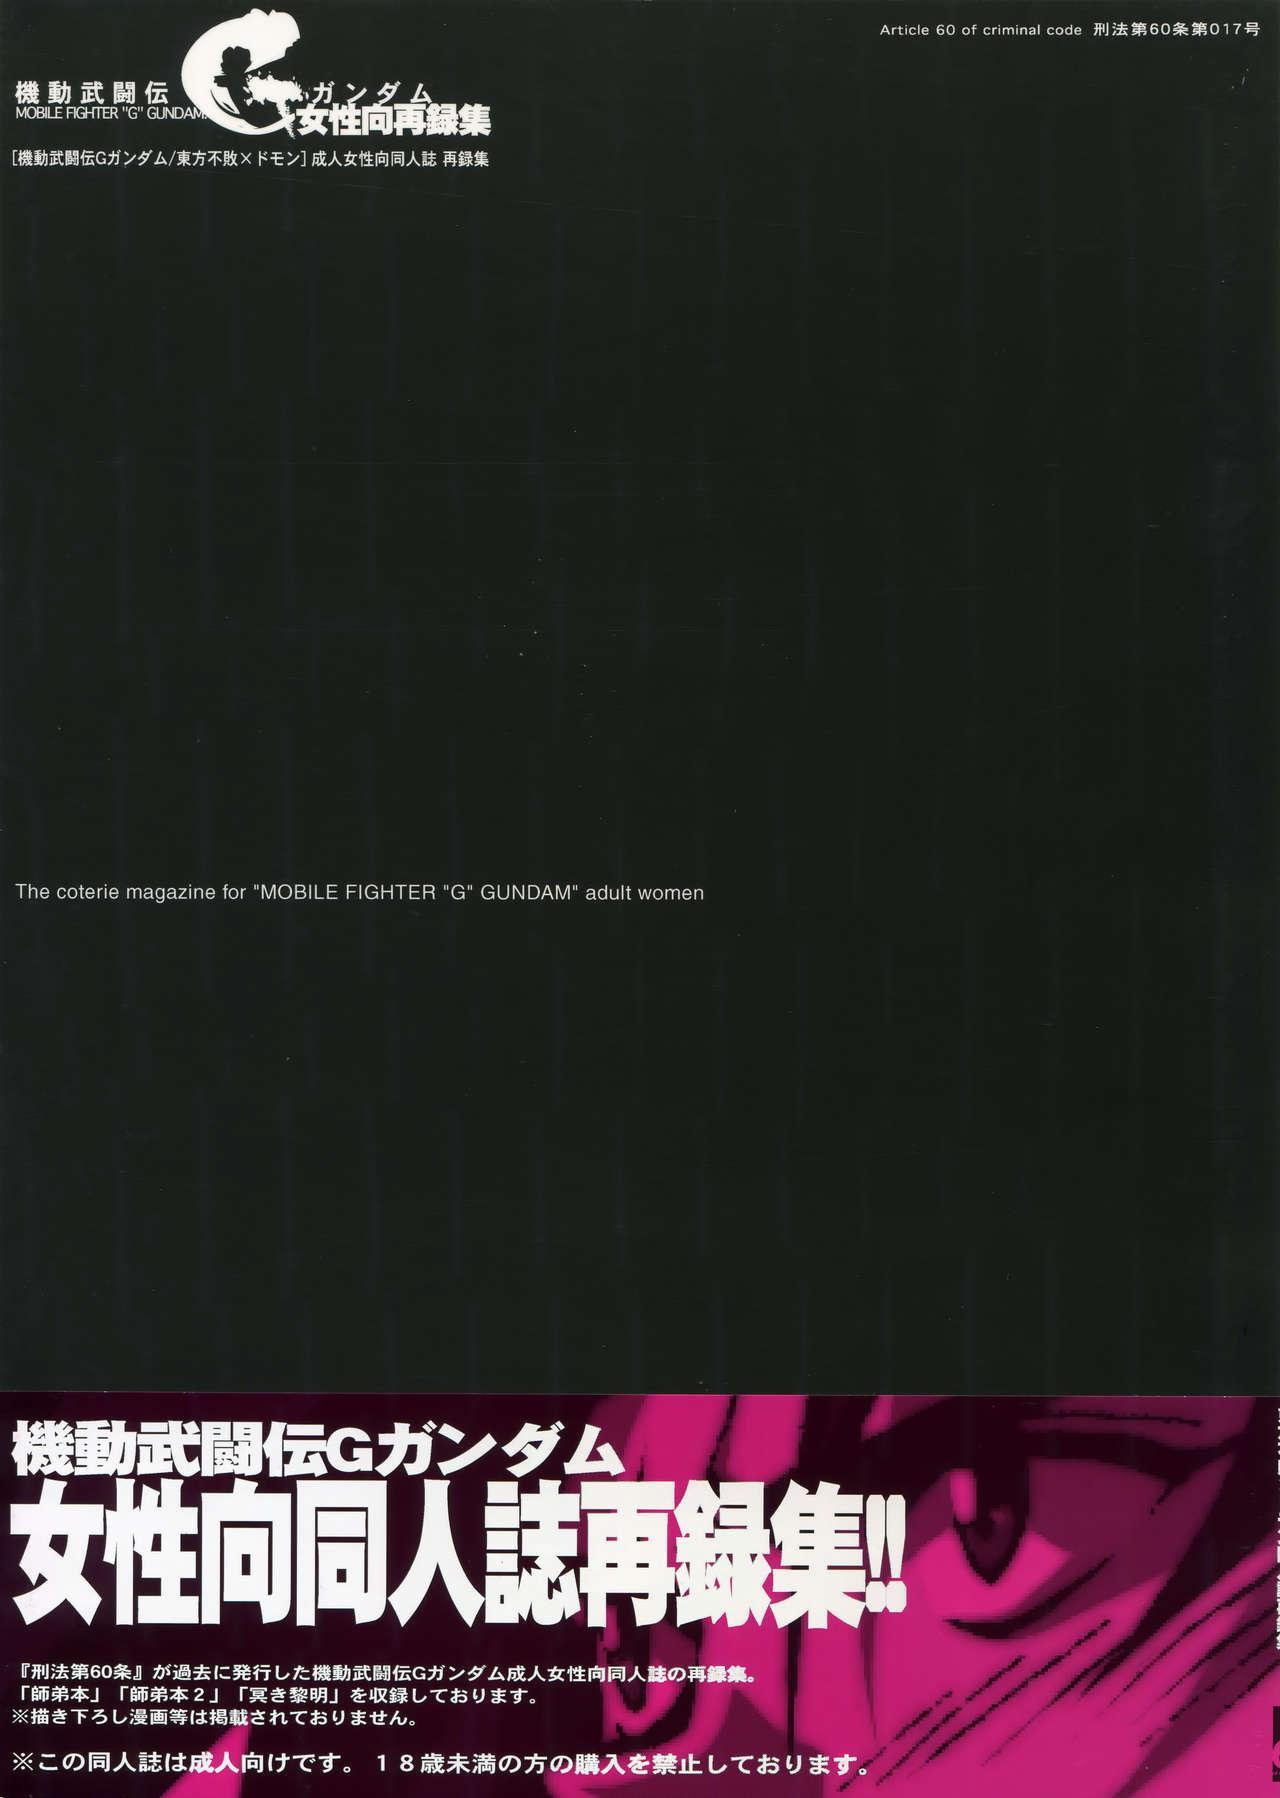 [Article 60 of Criminal Code (Shuhan)] G-gan Josei-Muke Sairoku-Shuu (G Gundam) 0